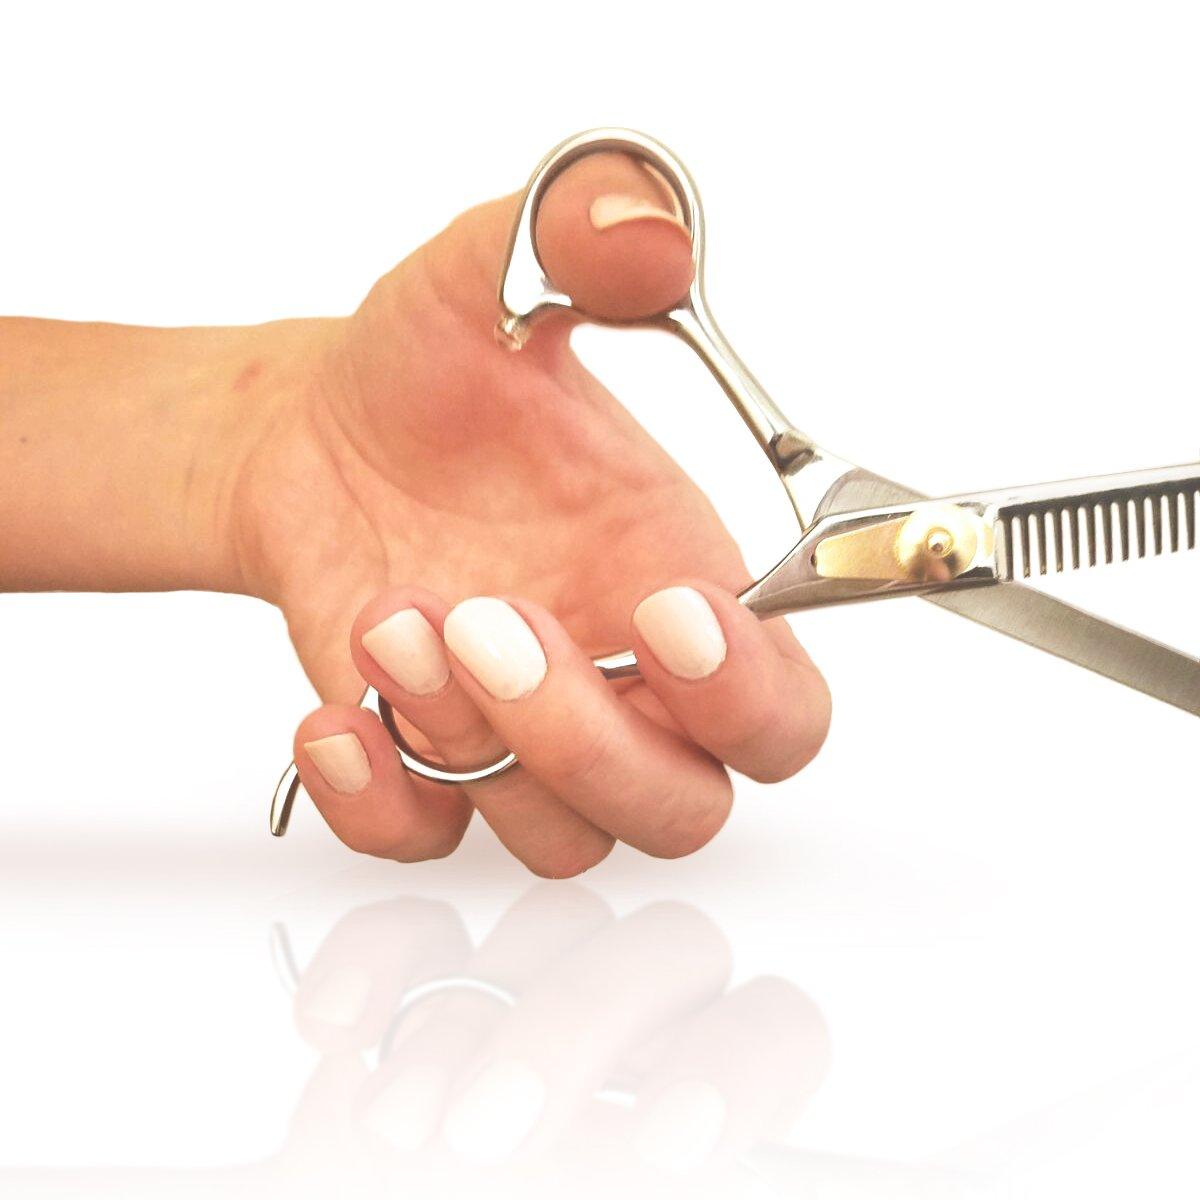 Professional Barber Scissor Hair Cutting Set - 6.5'' - 1 Straight Edge Hair Scissor, 1 Texturizing Thinning Shears, Plus Bonus Faux Leather Case - By ShearGuru … by ShearGuru (Image #9)